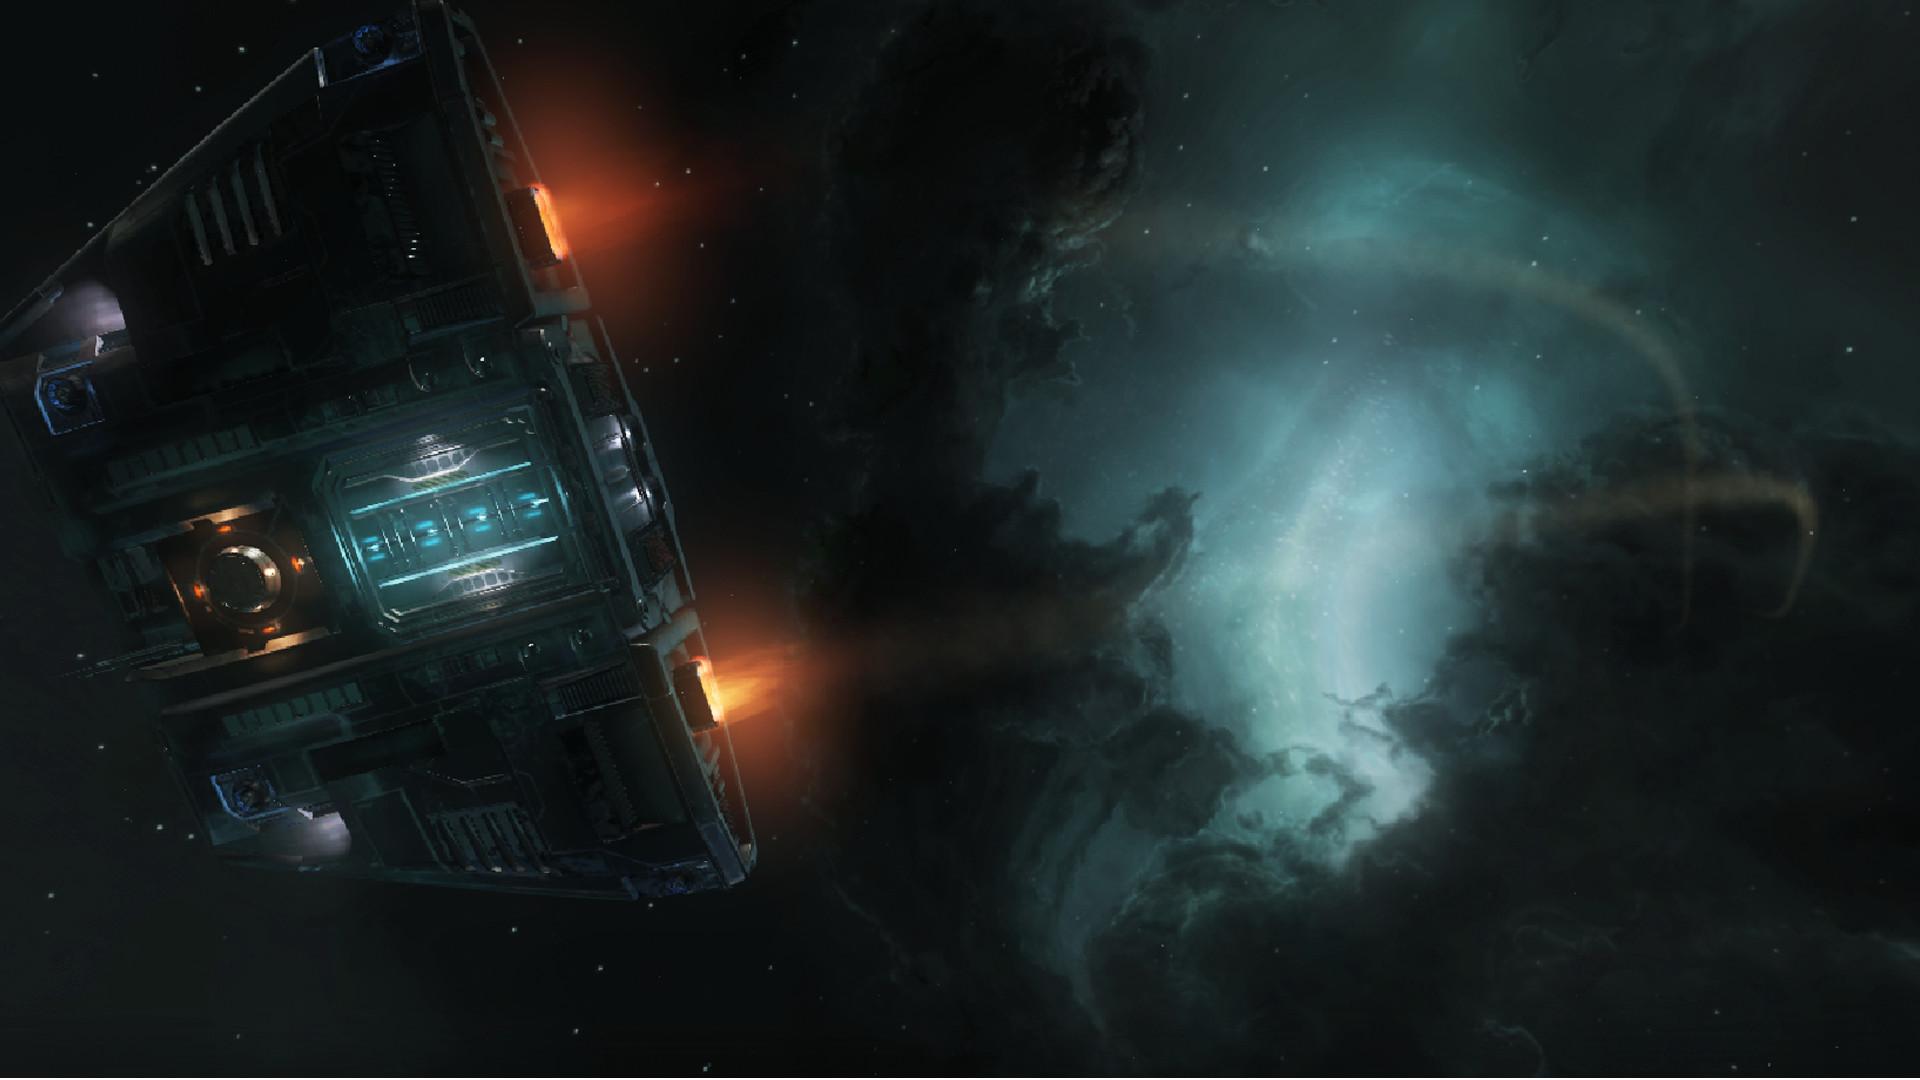 ELITE DANGEROUS sci-fi spaceship game rs wallpaper | | 167512 |  WallpaperUP